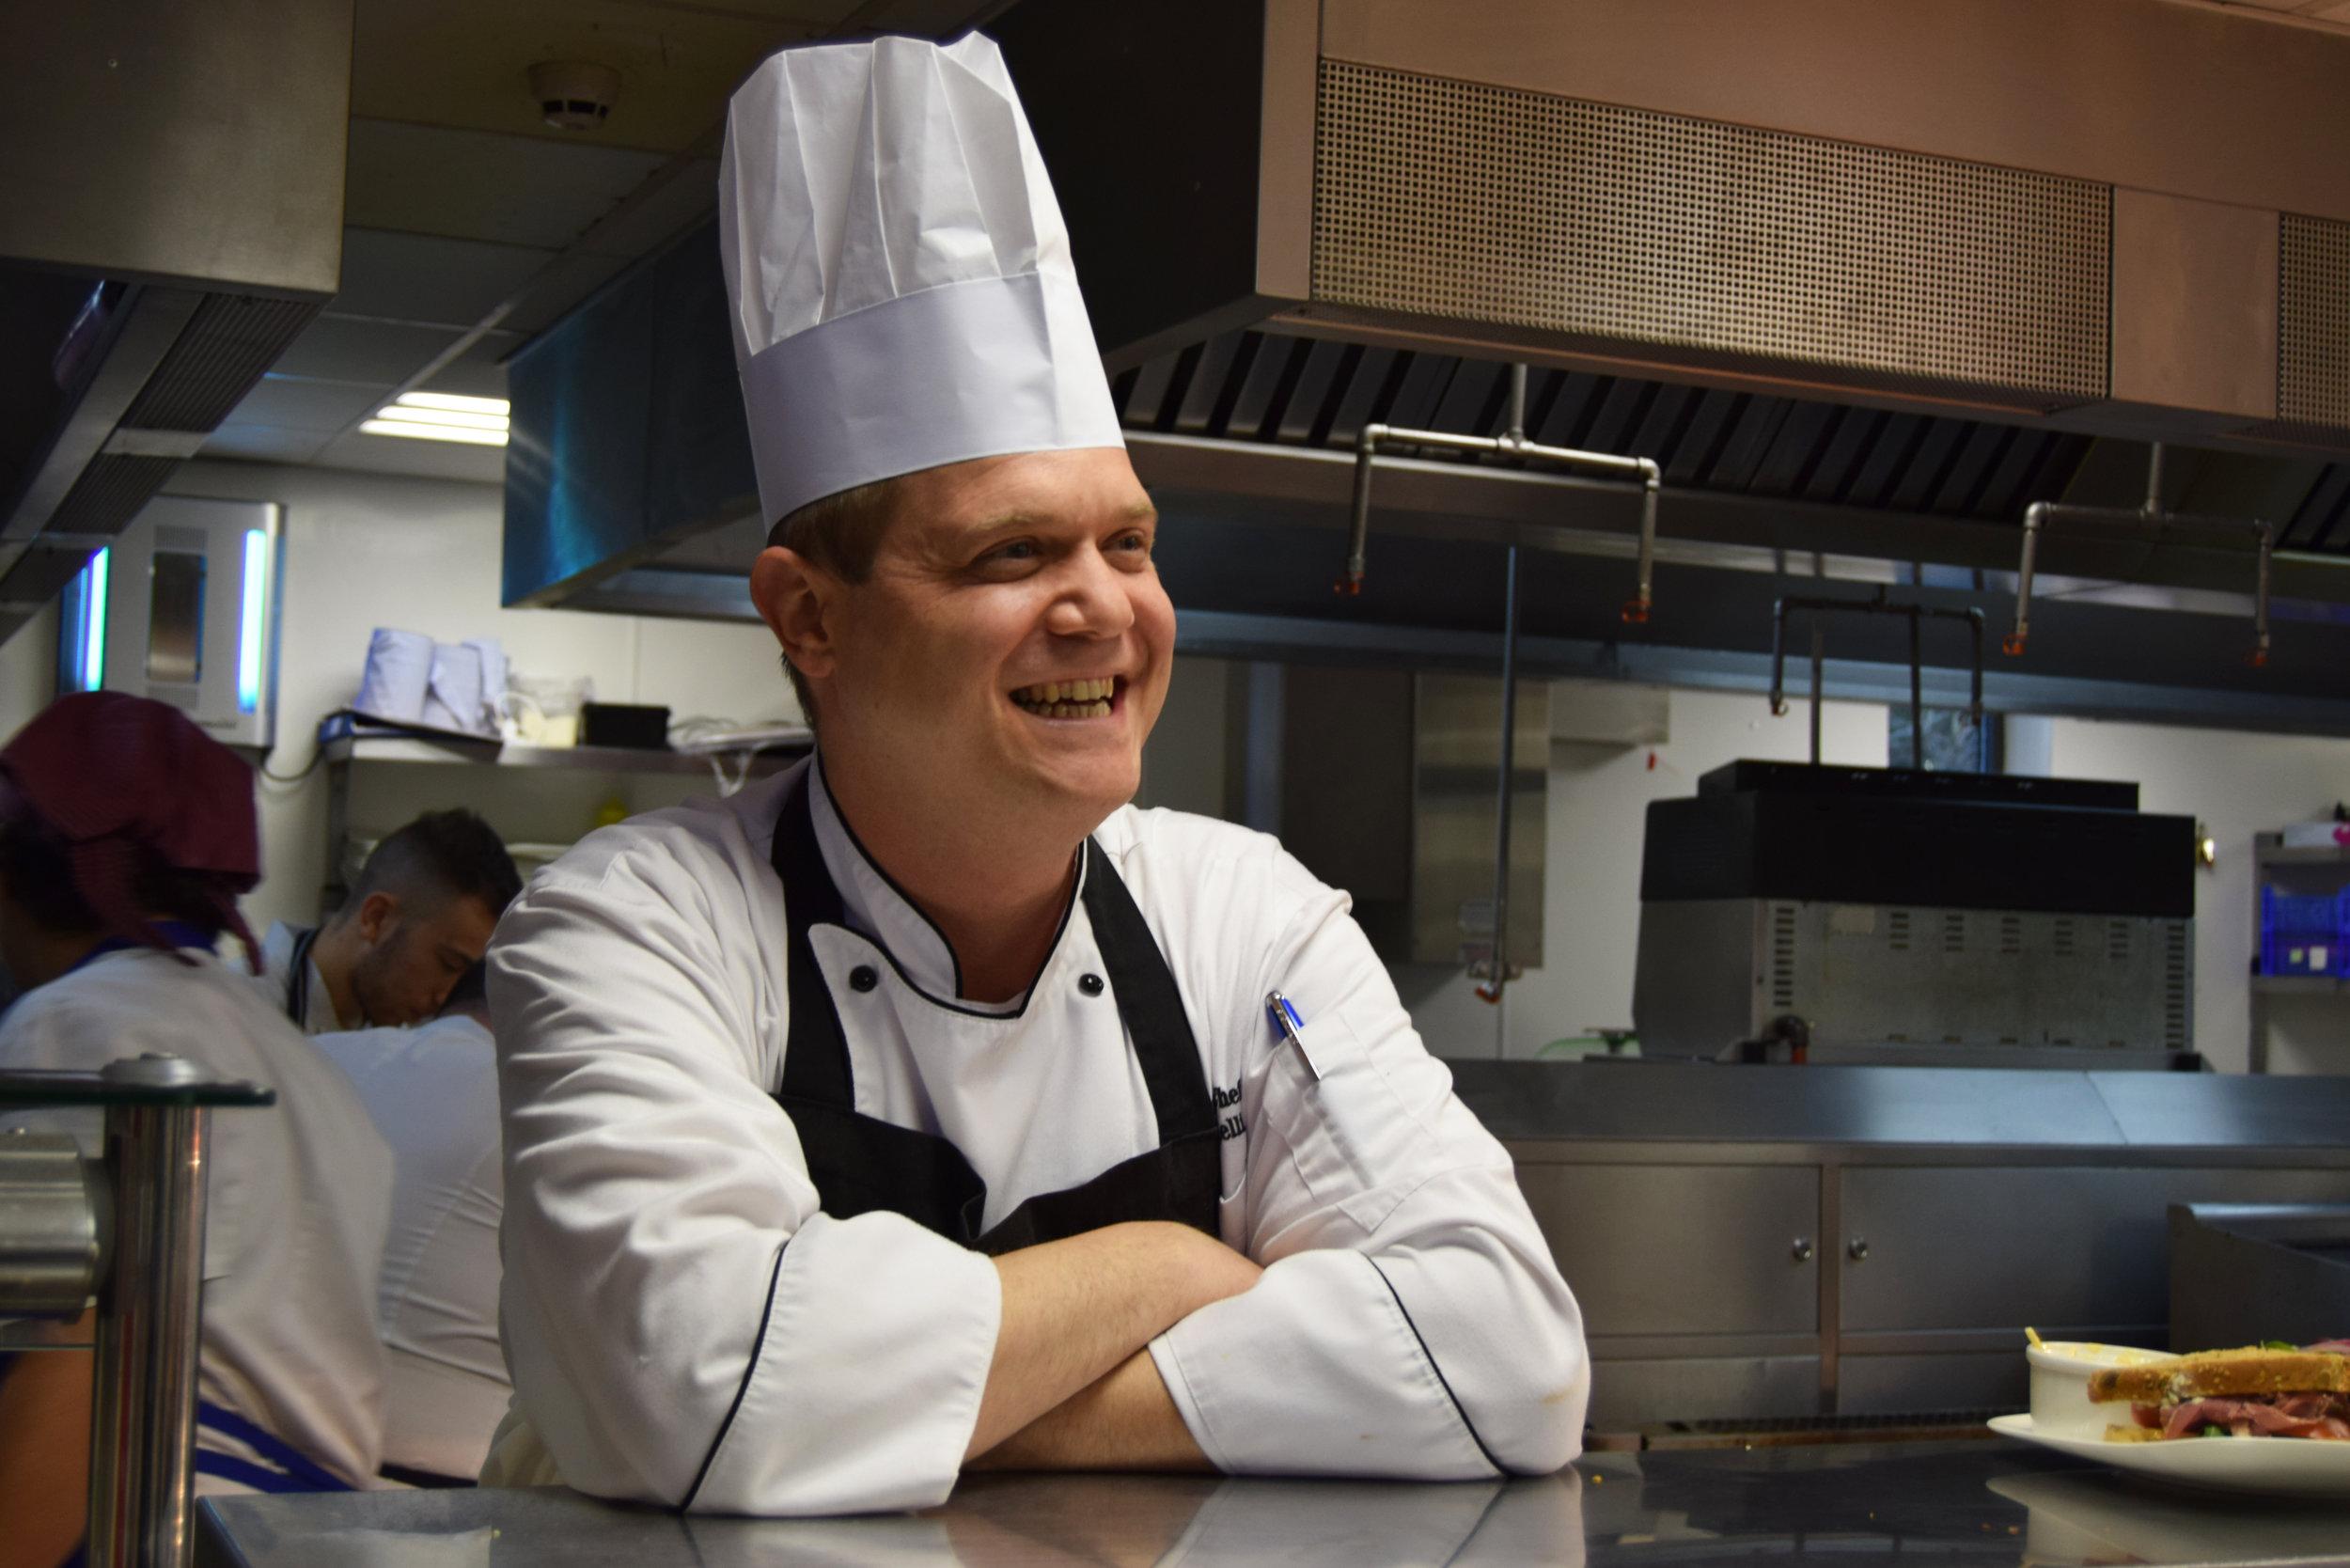 Chef Ugo Simonelli Lifehouse Spa Restaurant in Essex